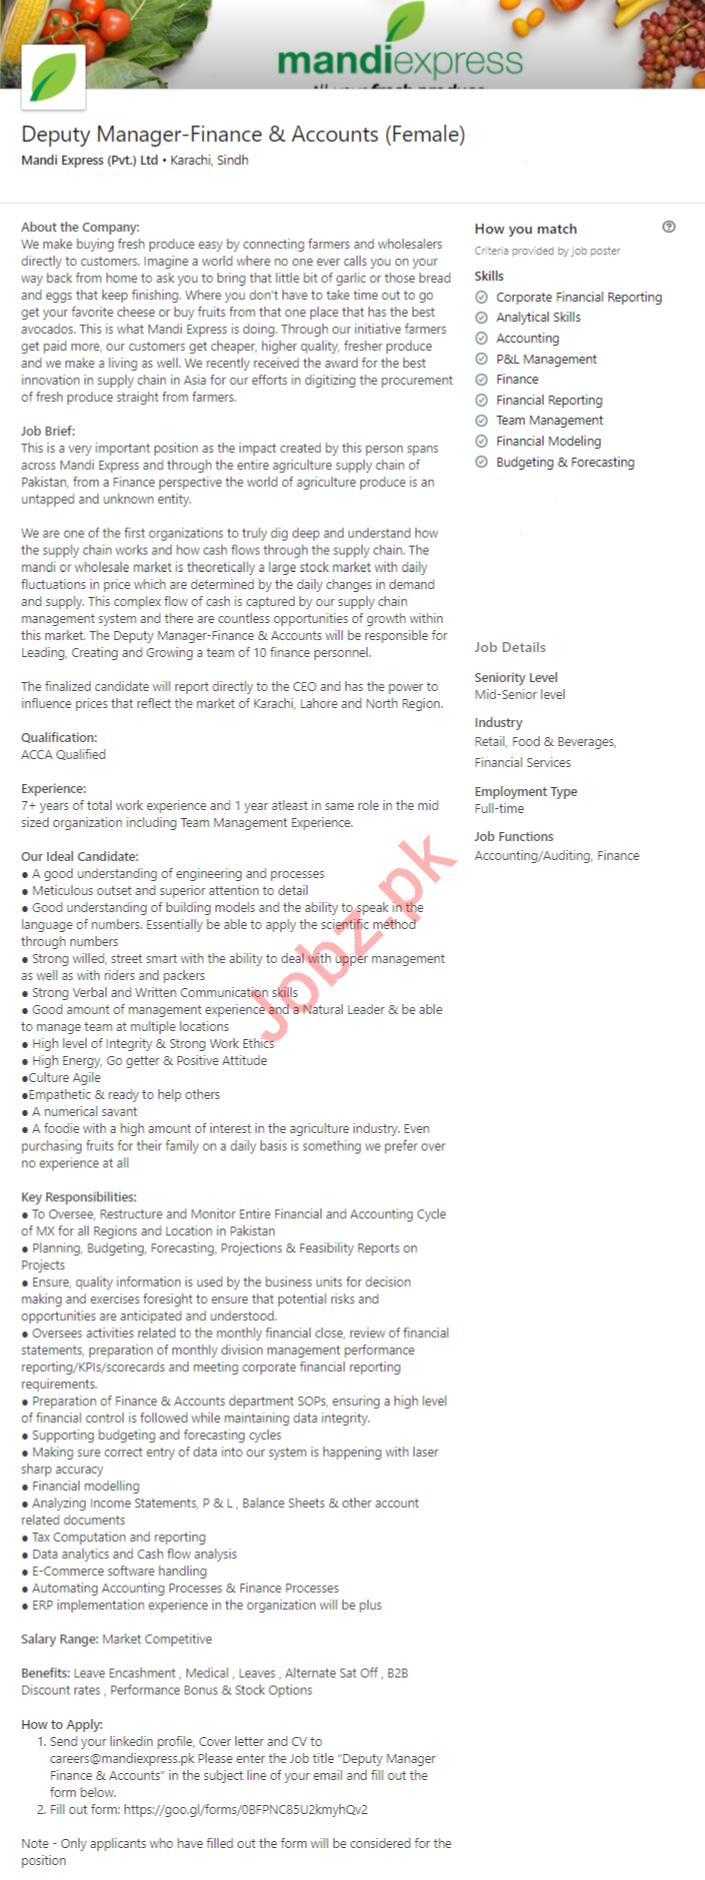 Mandi Express Karachi Jobs 2020 for Deputy Manager